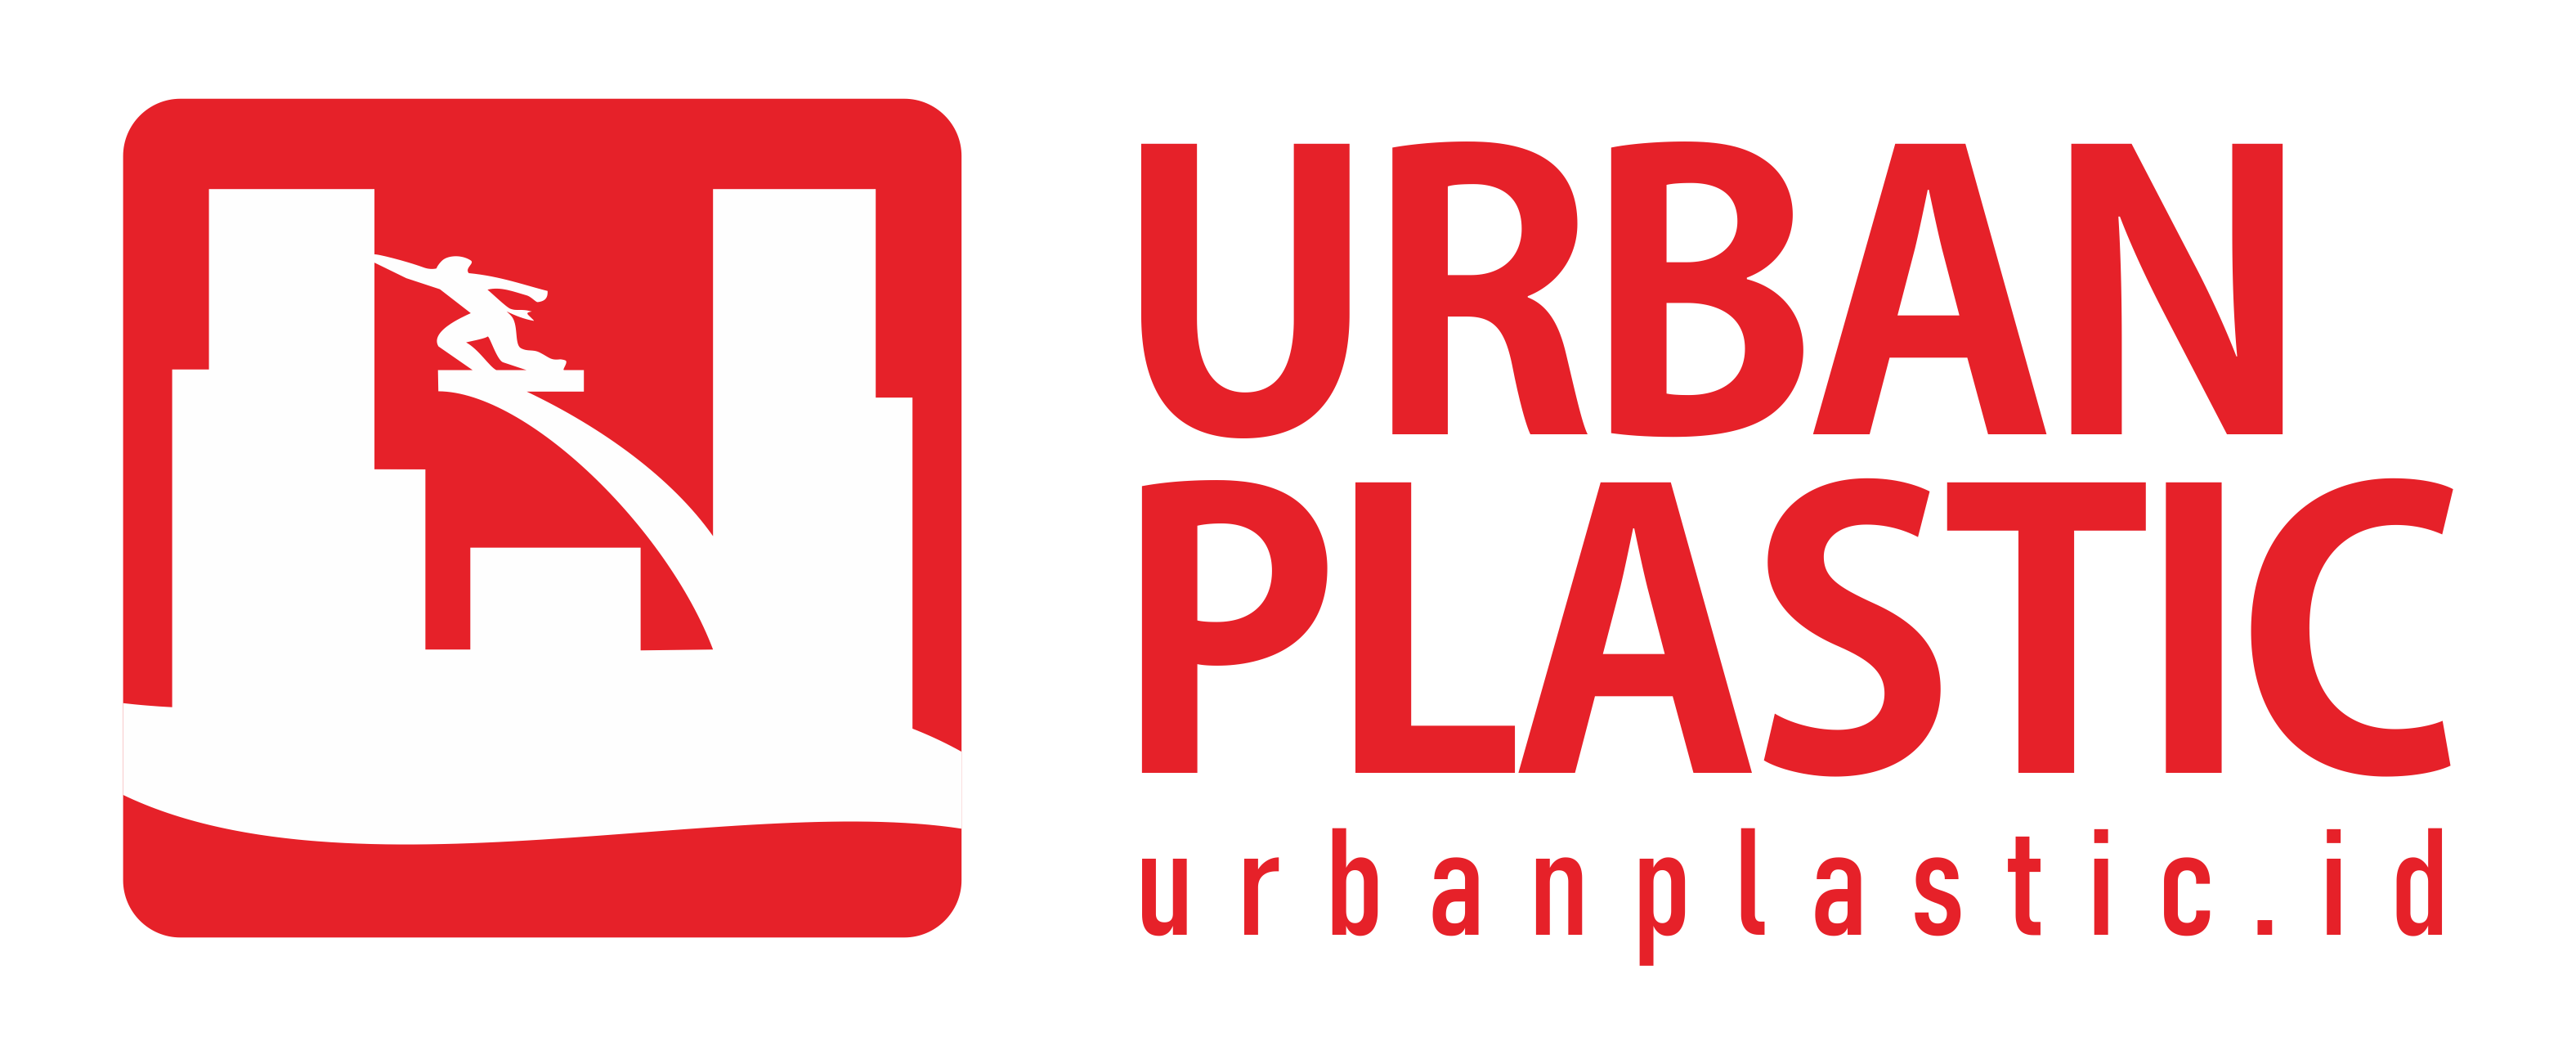 Jual Plastik Sampah, Plastik Cor, Geotextile, Geomembrane, Plastik Mulsa, Plastik Polybag, Karung Plastik, Karung Kertas, Plastik UV, Kantong Mayat Langsung dari Pabrik